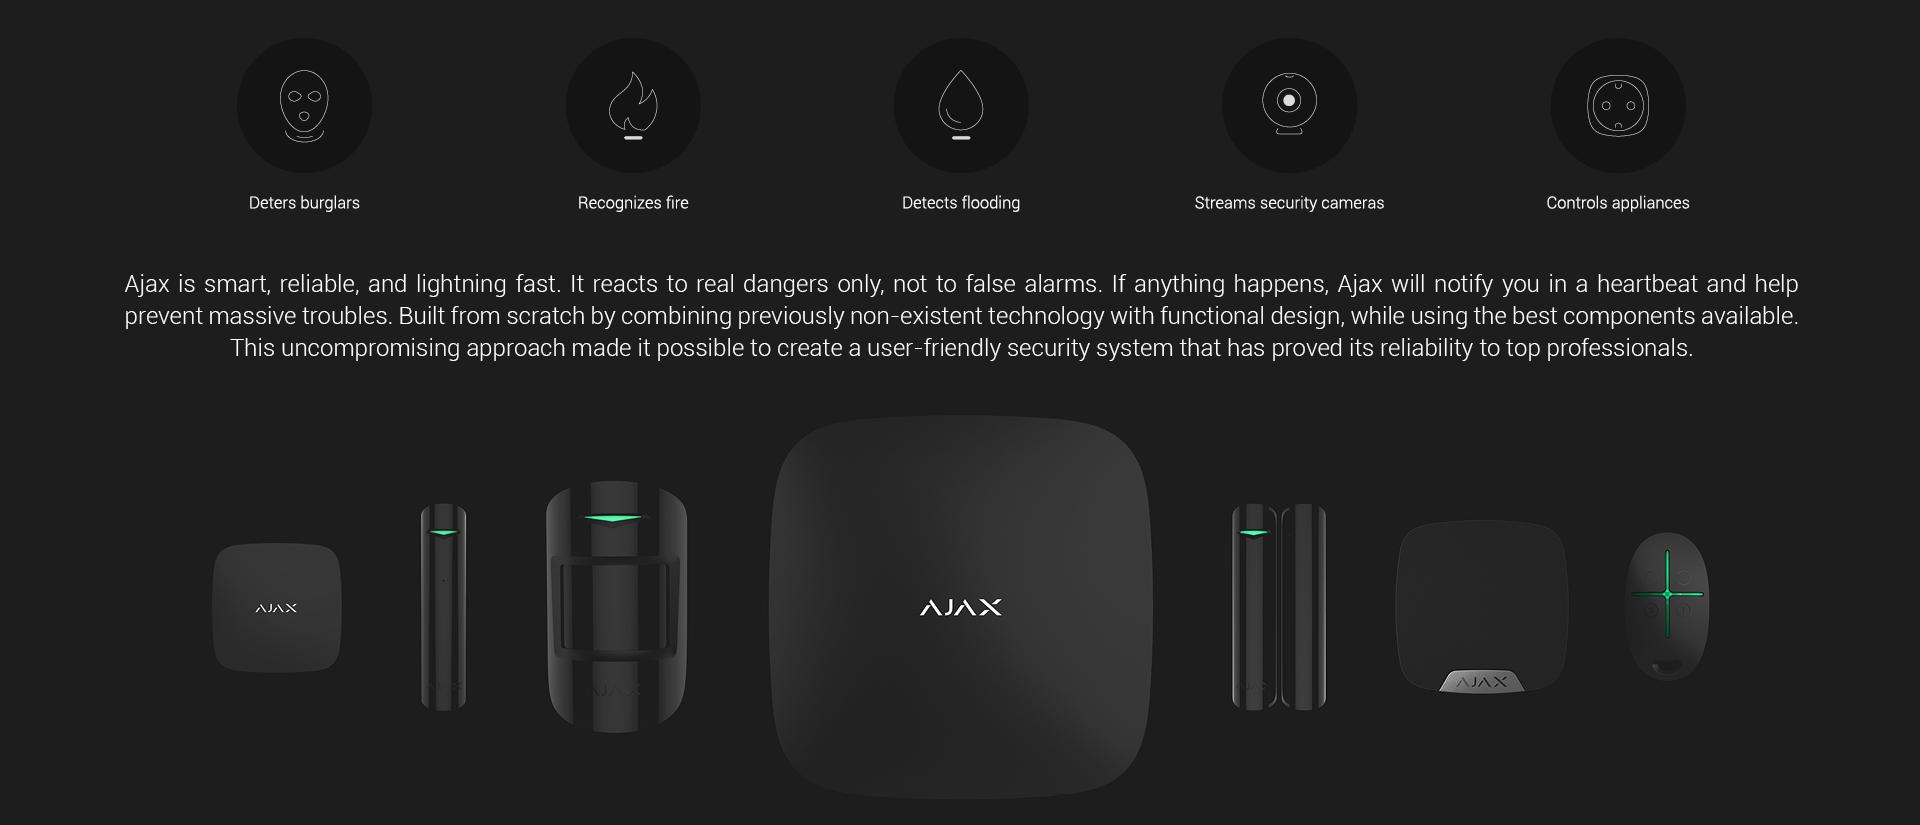 Ajax Security Systems